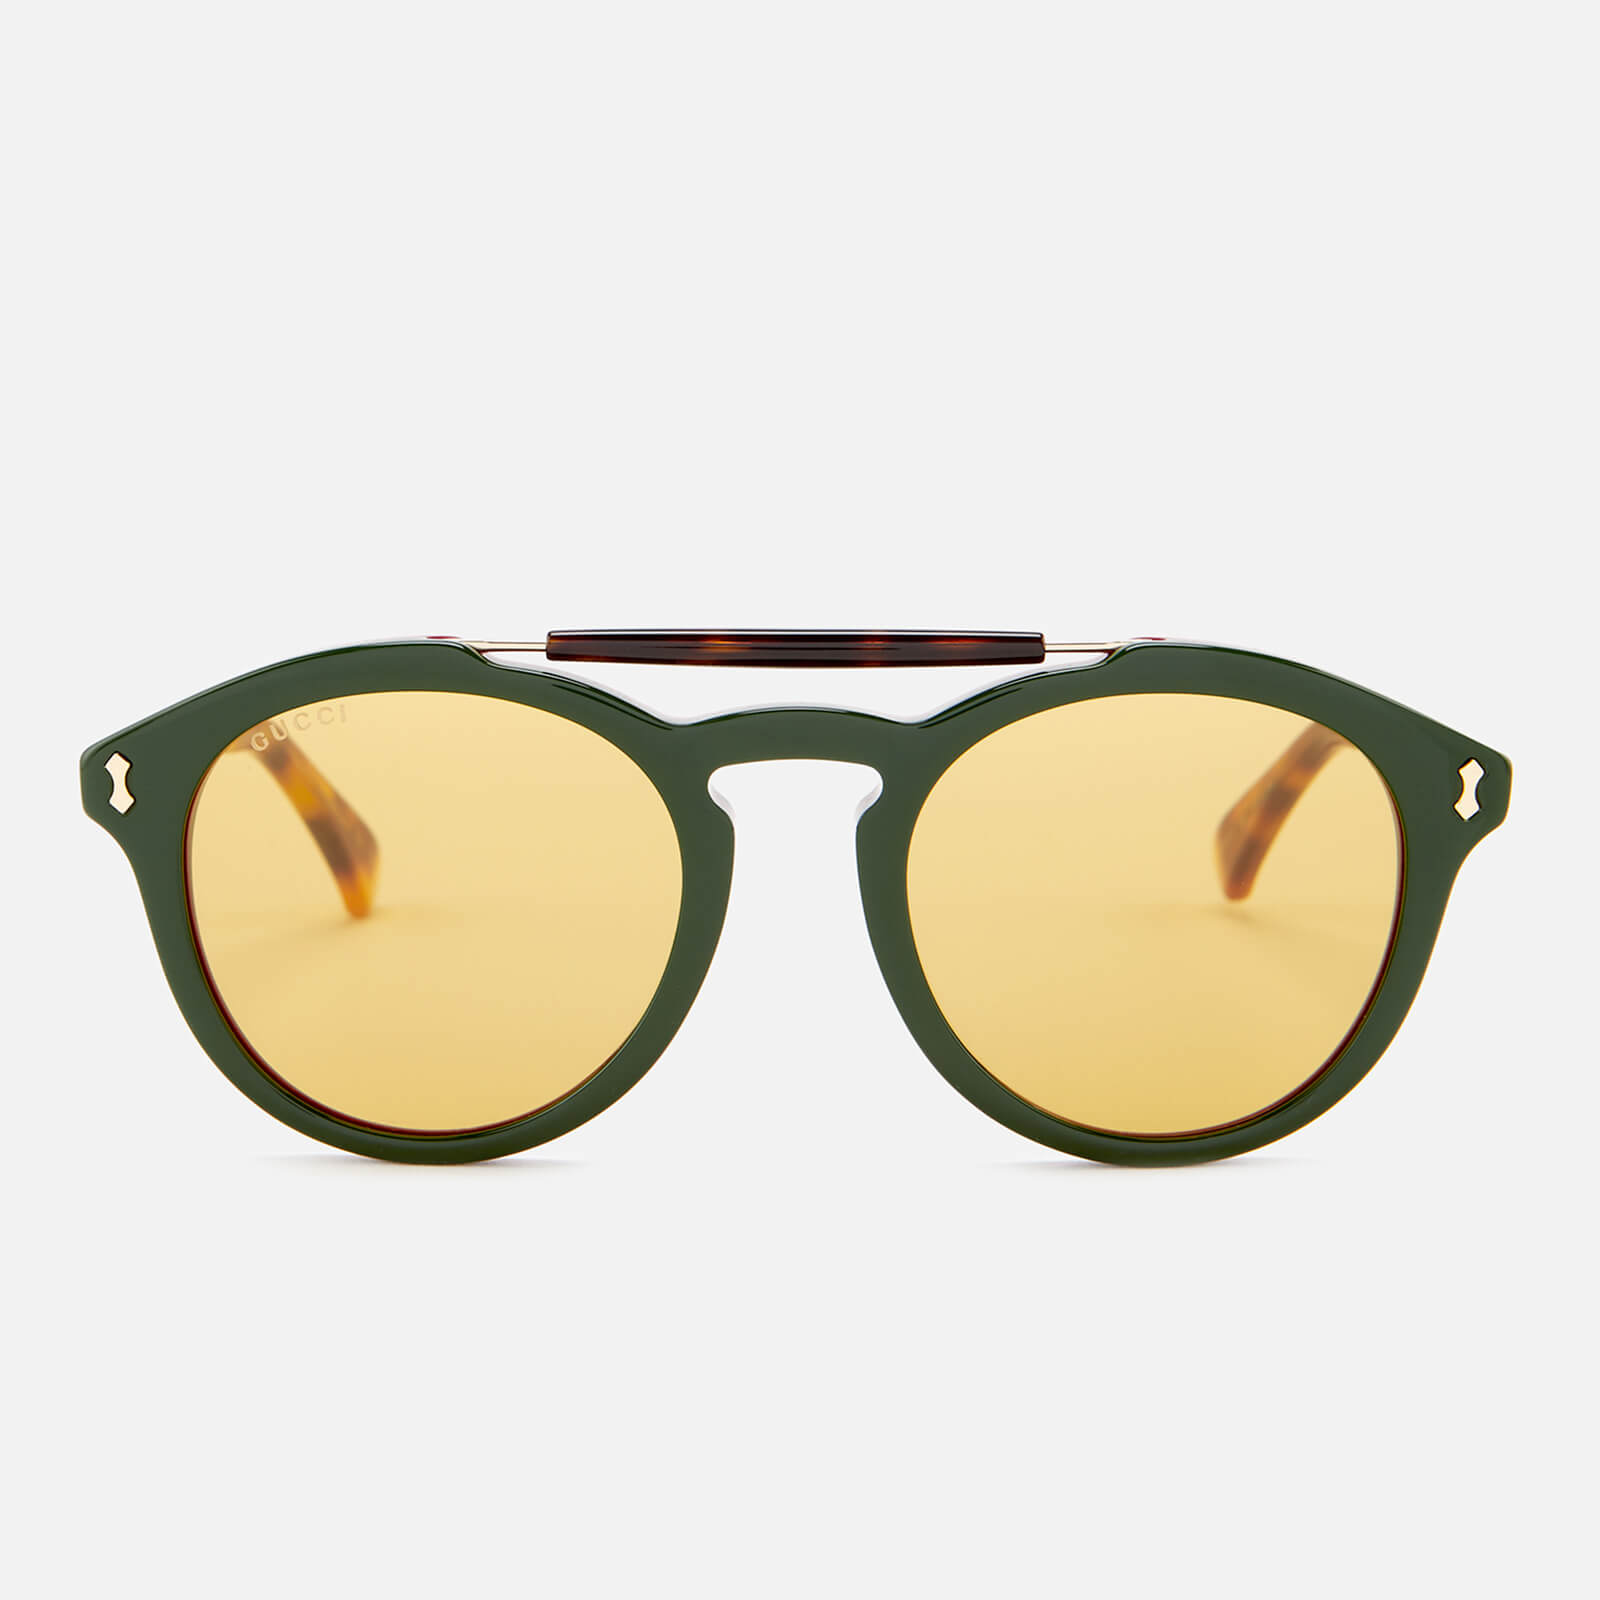 8f2fcee8937 Gucci Men s Flip Top Aviator Sunglasses - Havana Green - Free UK Delivery  over £50